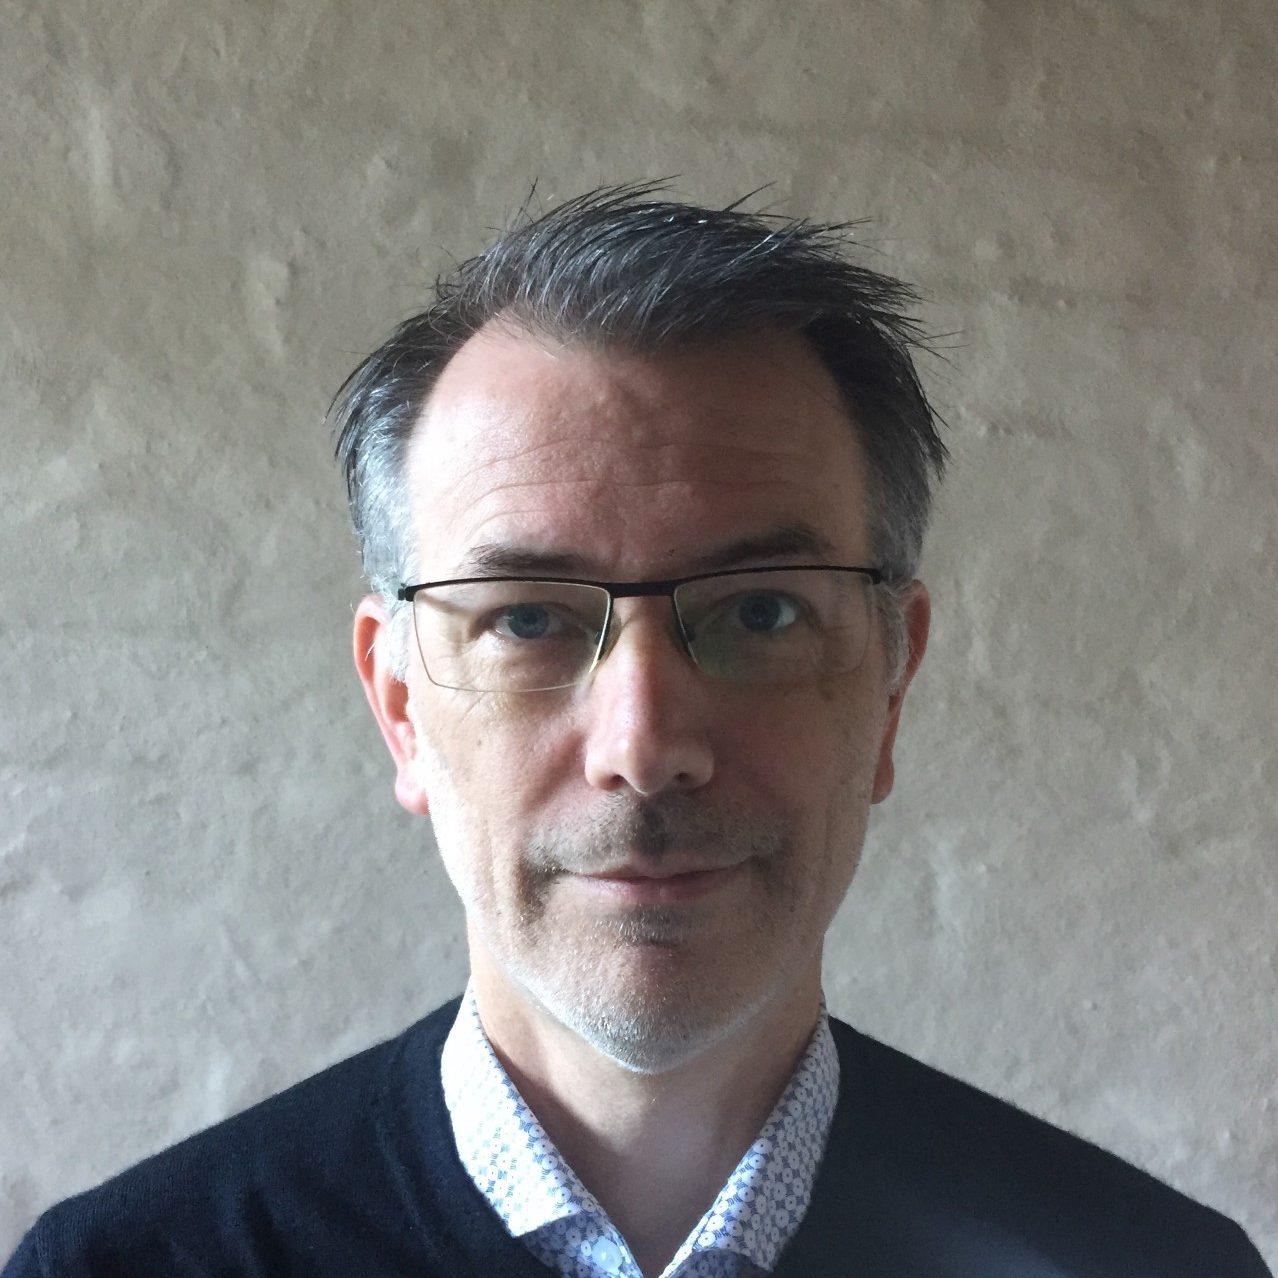 ADM+S Investigator Rowan Wilken